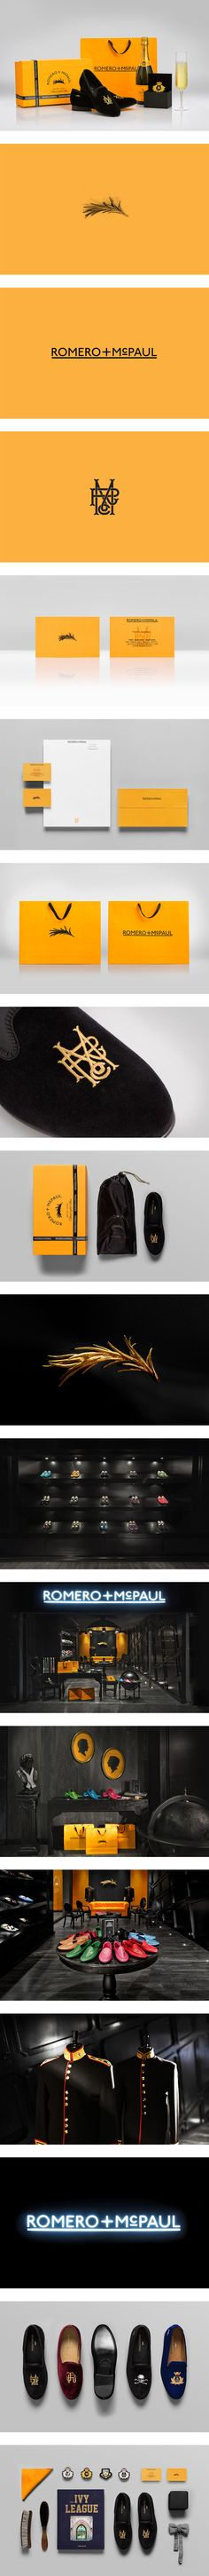 branding / identity | Romero+McPaul by Anagrama